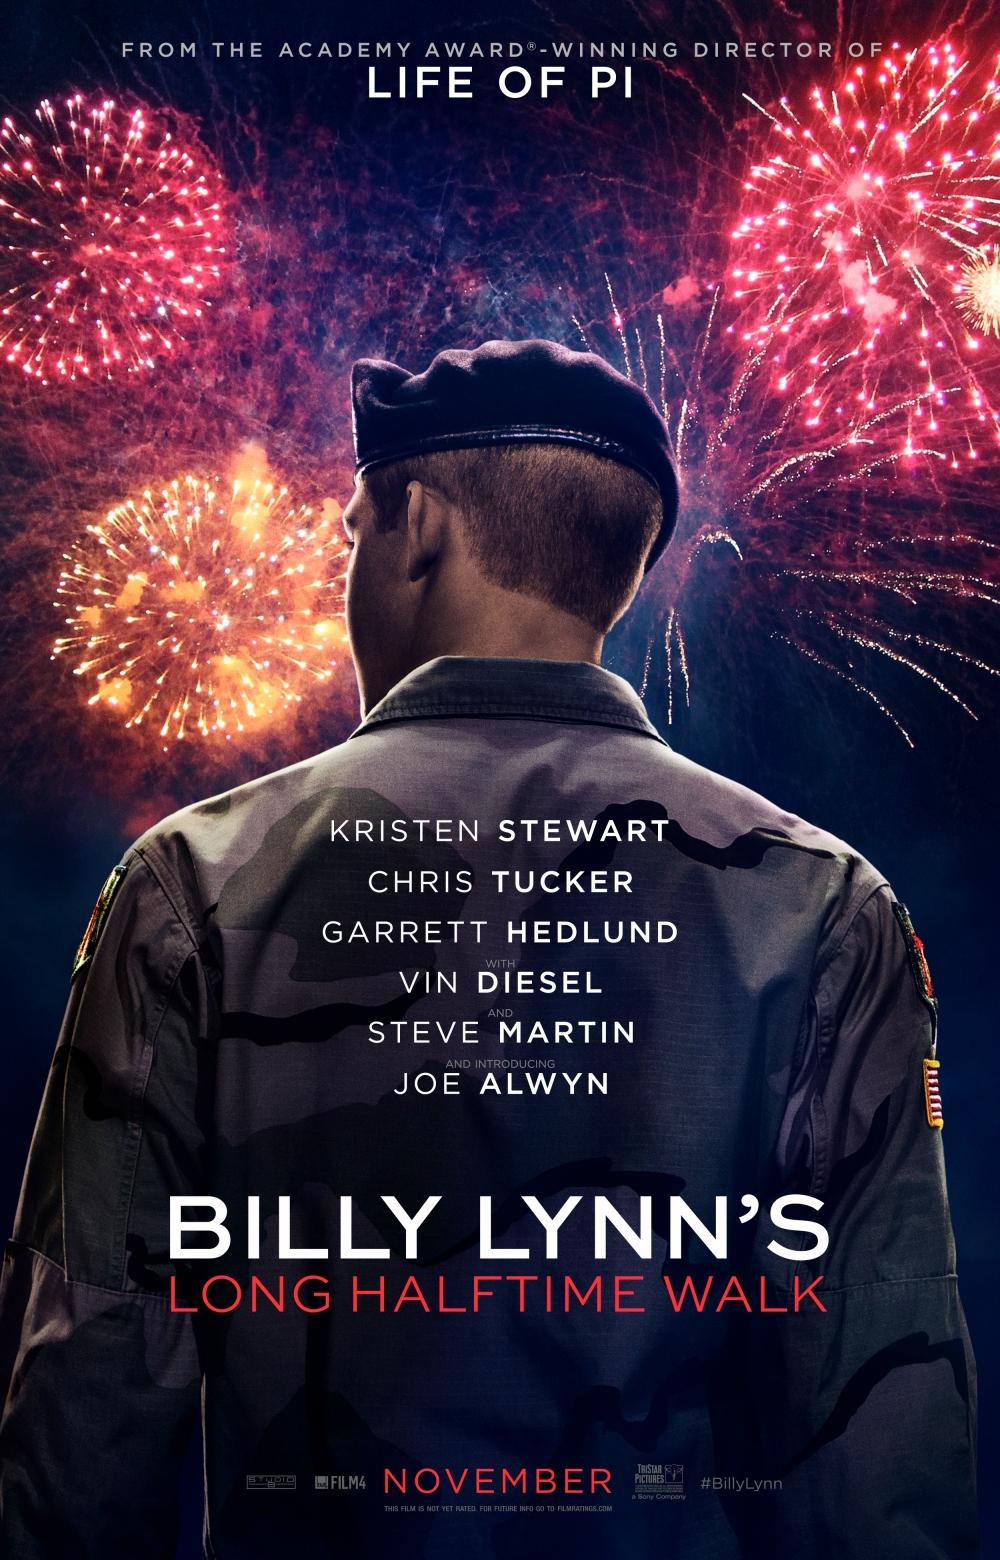 Billy Lynn's Long Halftime Walk - Official US Poster.jpg